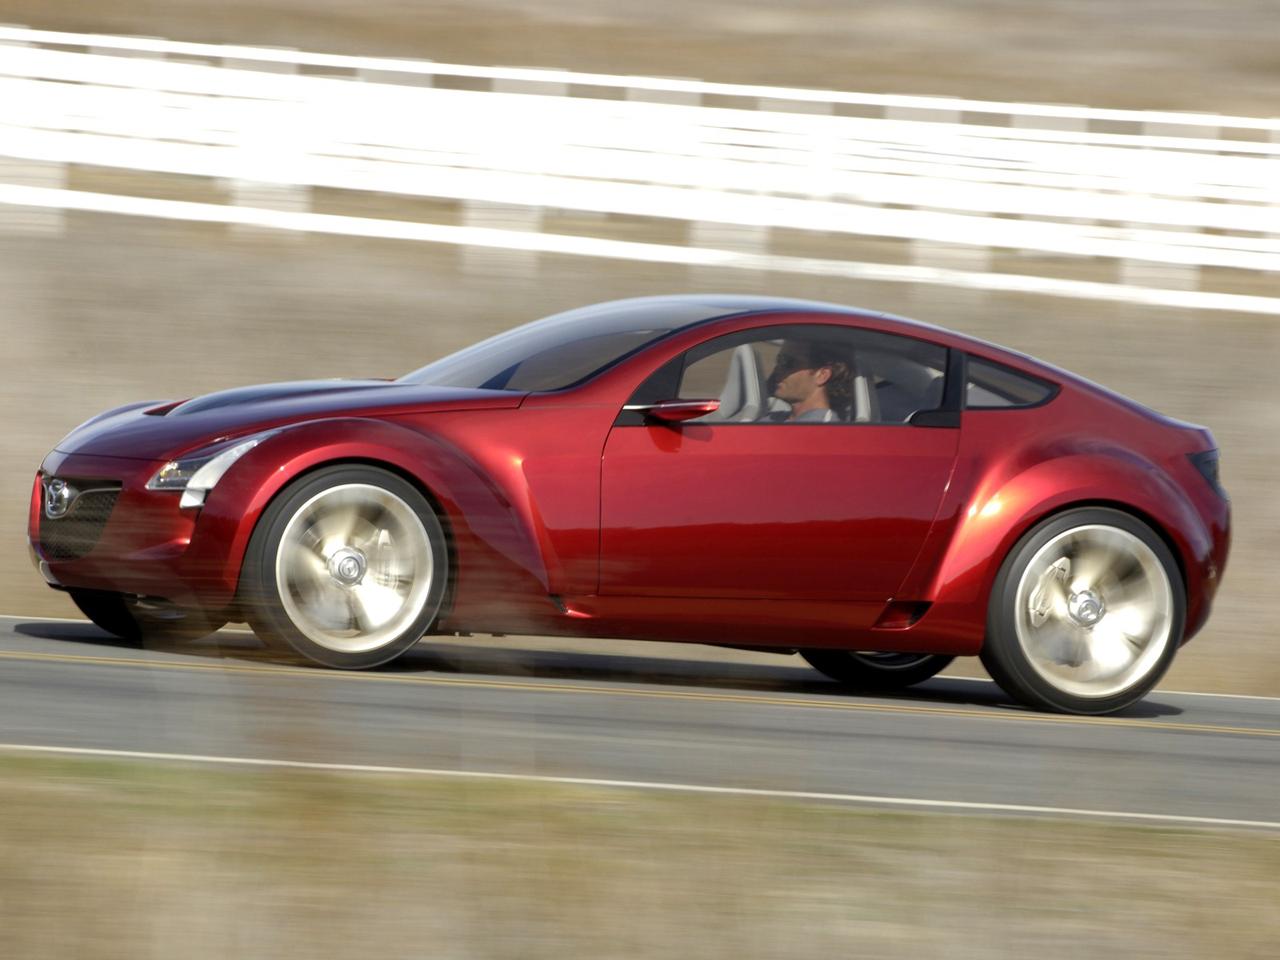 RX4KABURA Τριρότορο, biturbo, με 450 άλογα, το Mazda RX-9 ετοιμάζεται να φτύσει φλόγες concept, Mazda, Mazda RX-9, RX-7, rx-8, Wankel, zblog